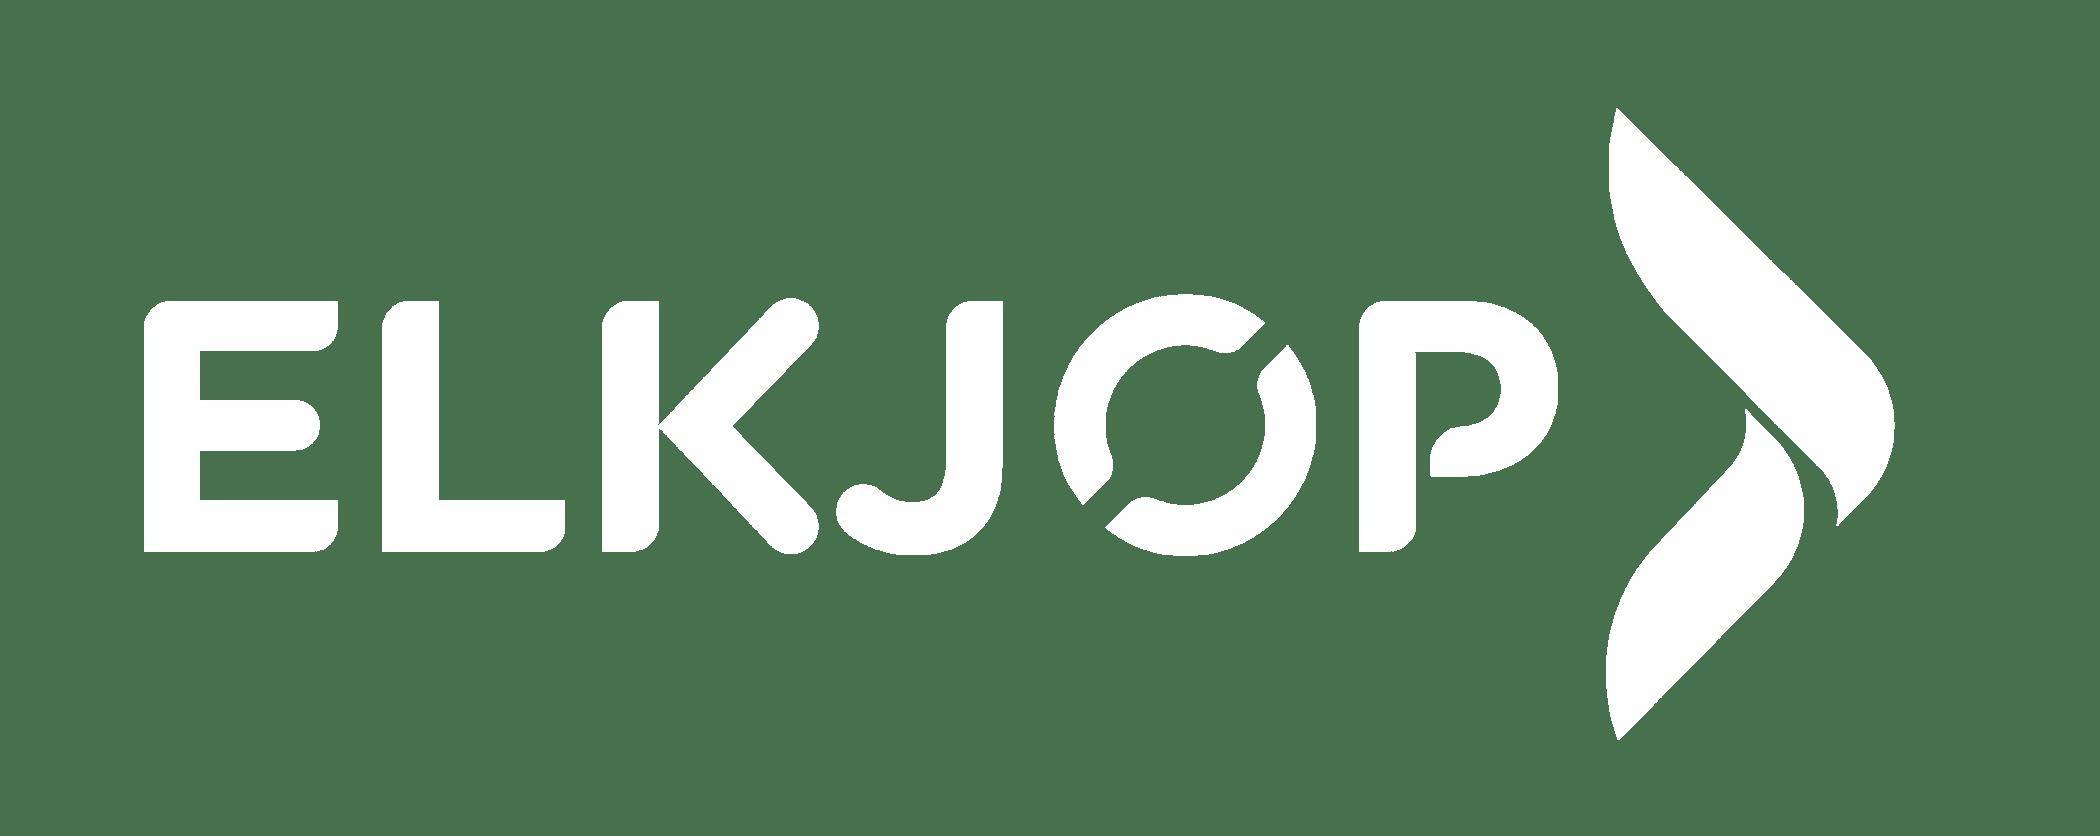 Elkjop_logo_hvit.png